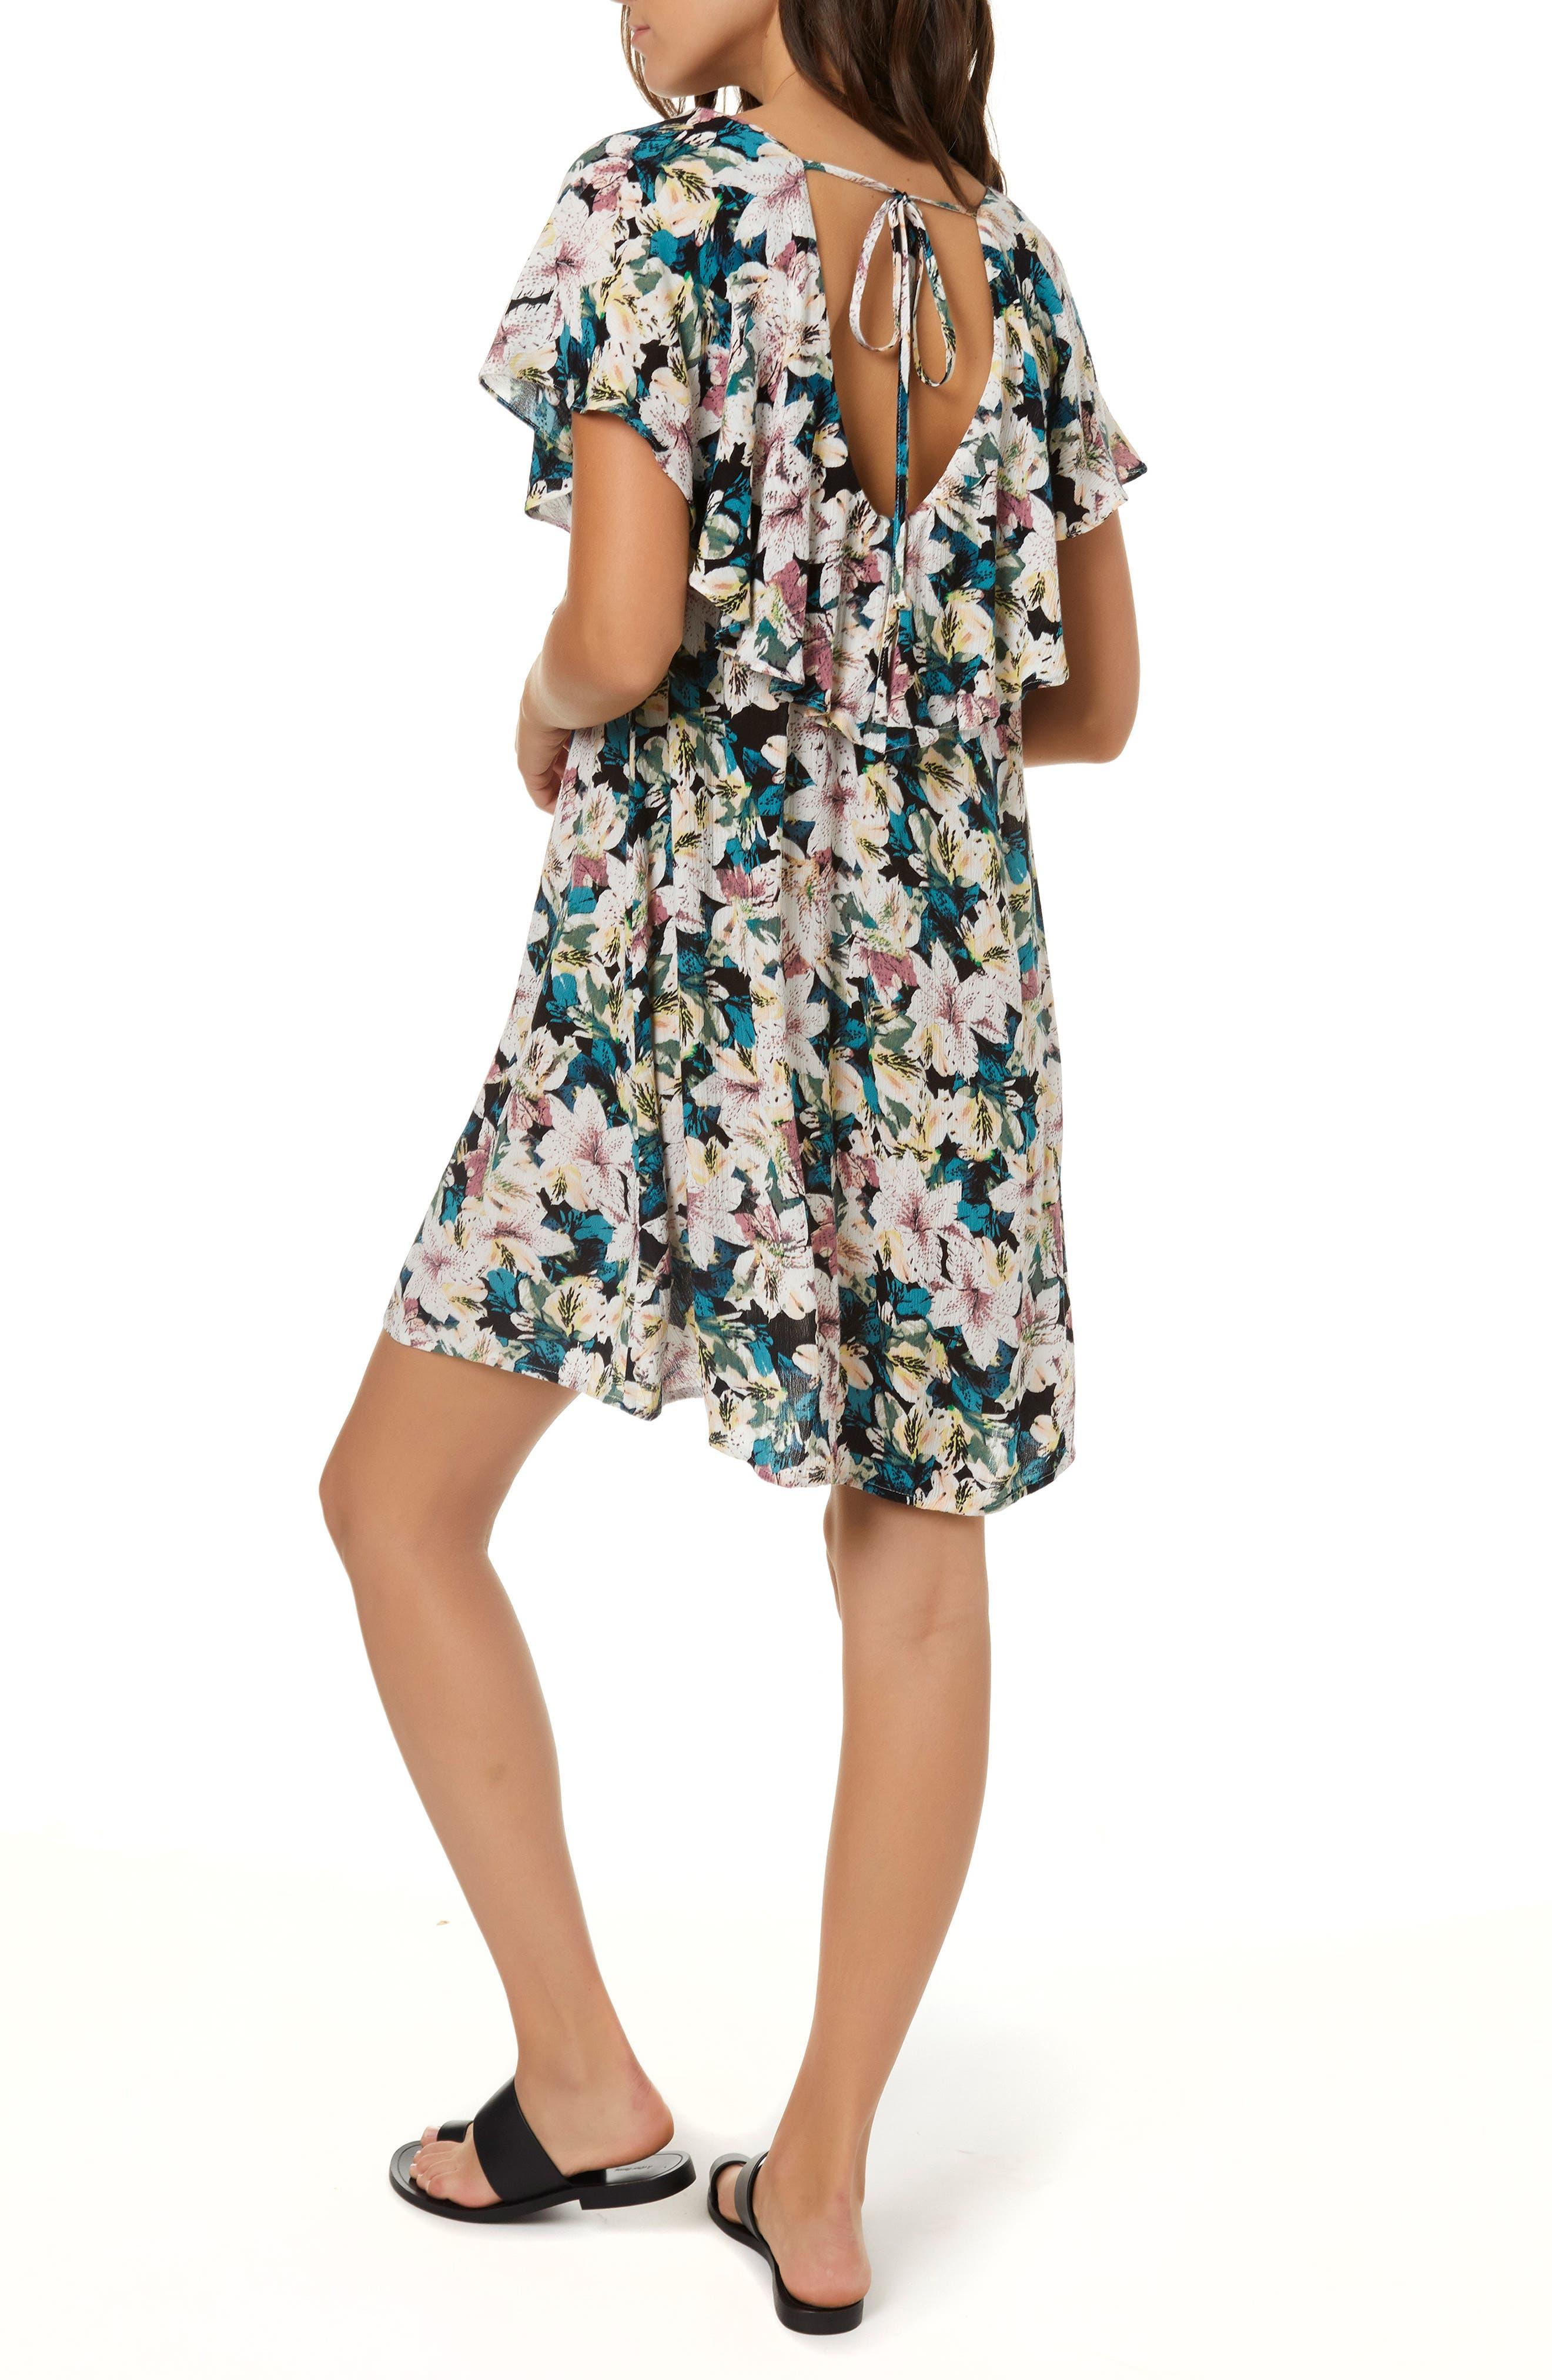 Miran Floral Print Woven Dress,                             Alternate thumbnail 2, color,                             100